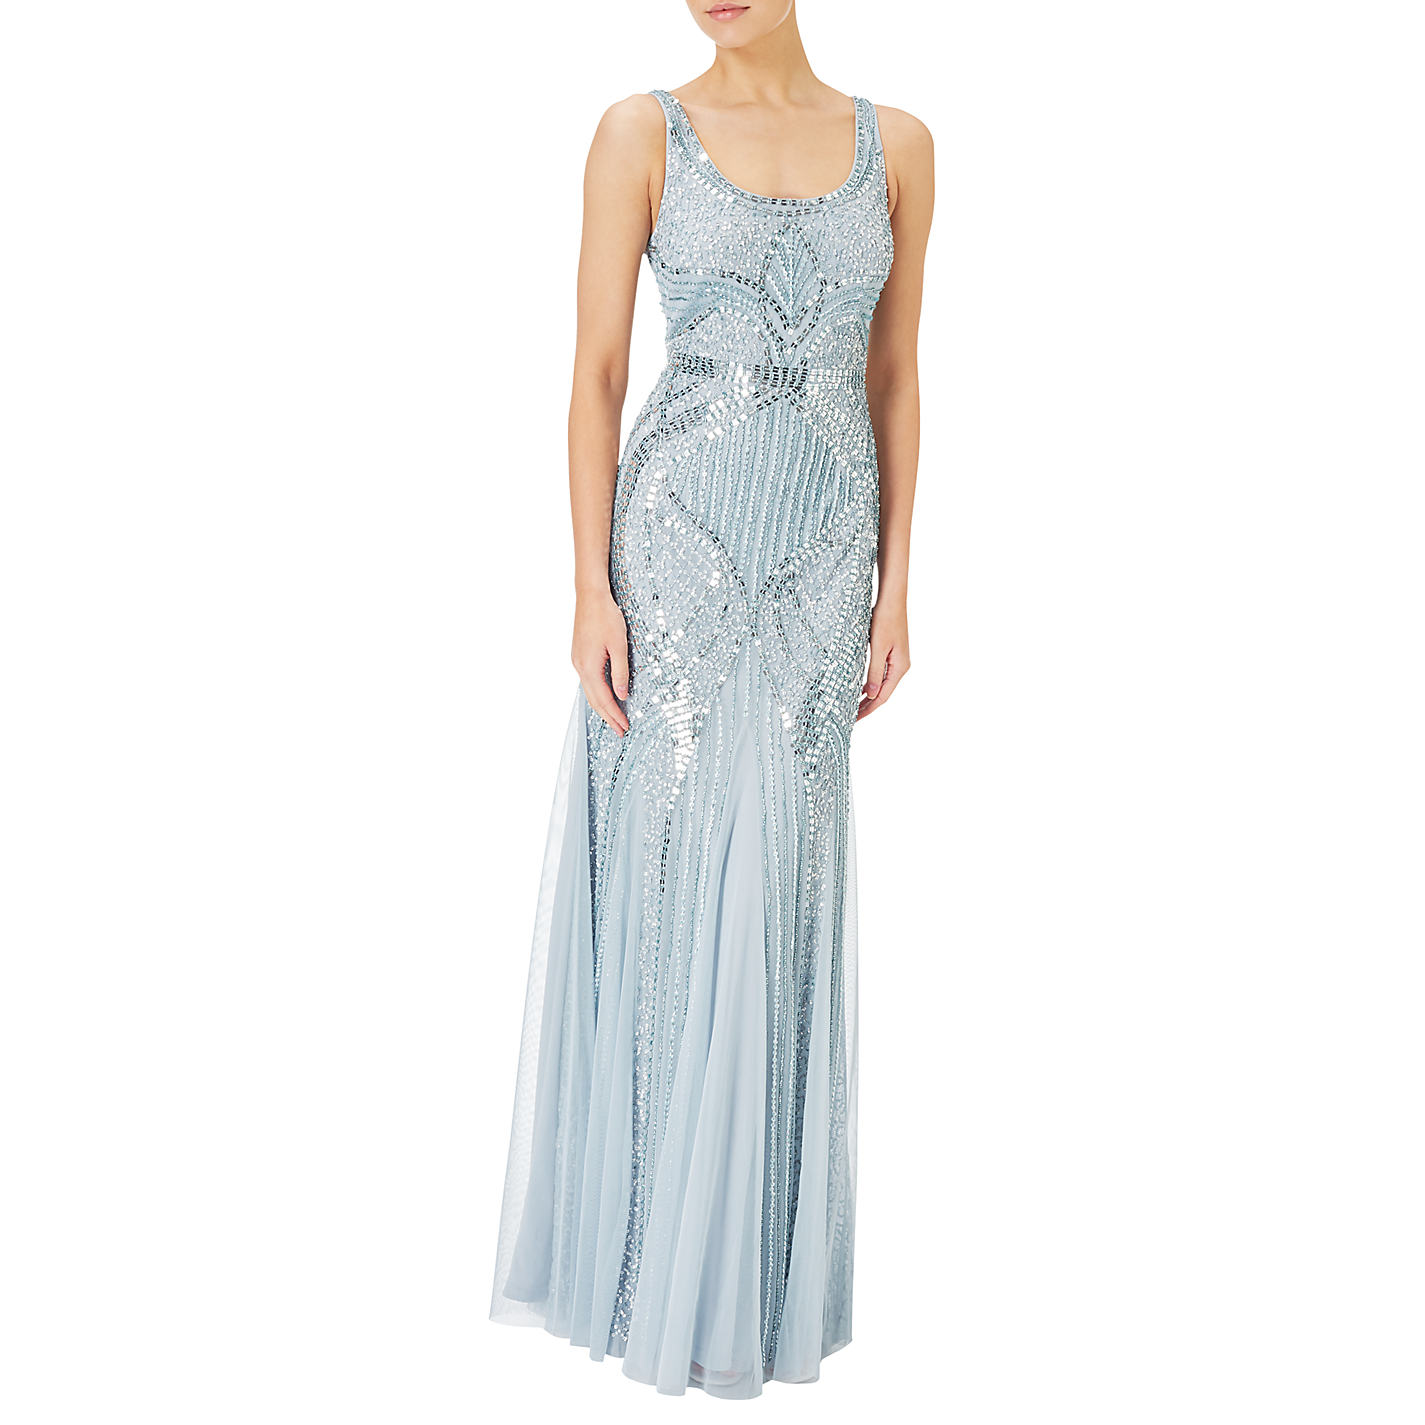 John lewis long evening dresses - Best dresses collection